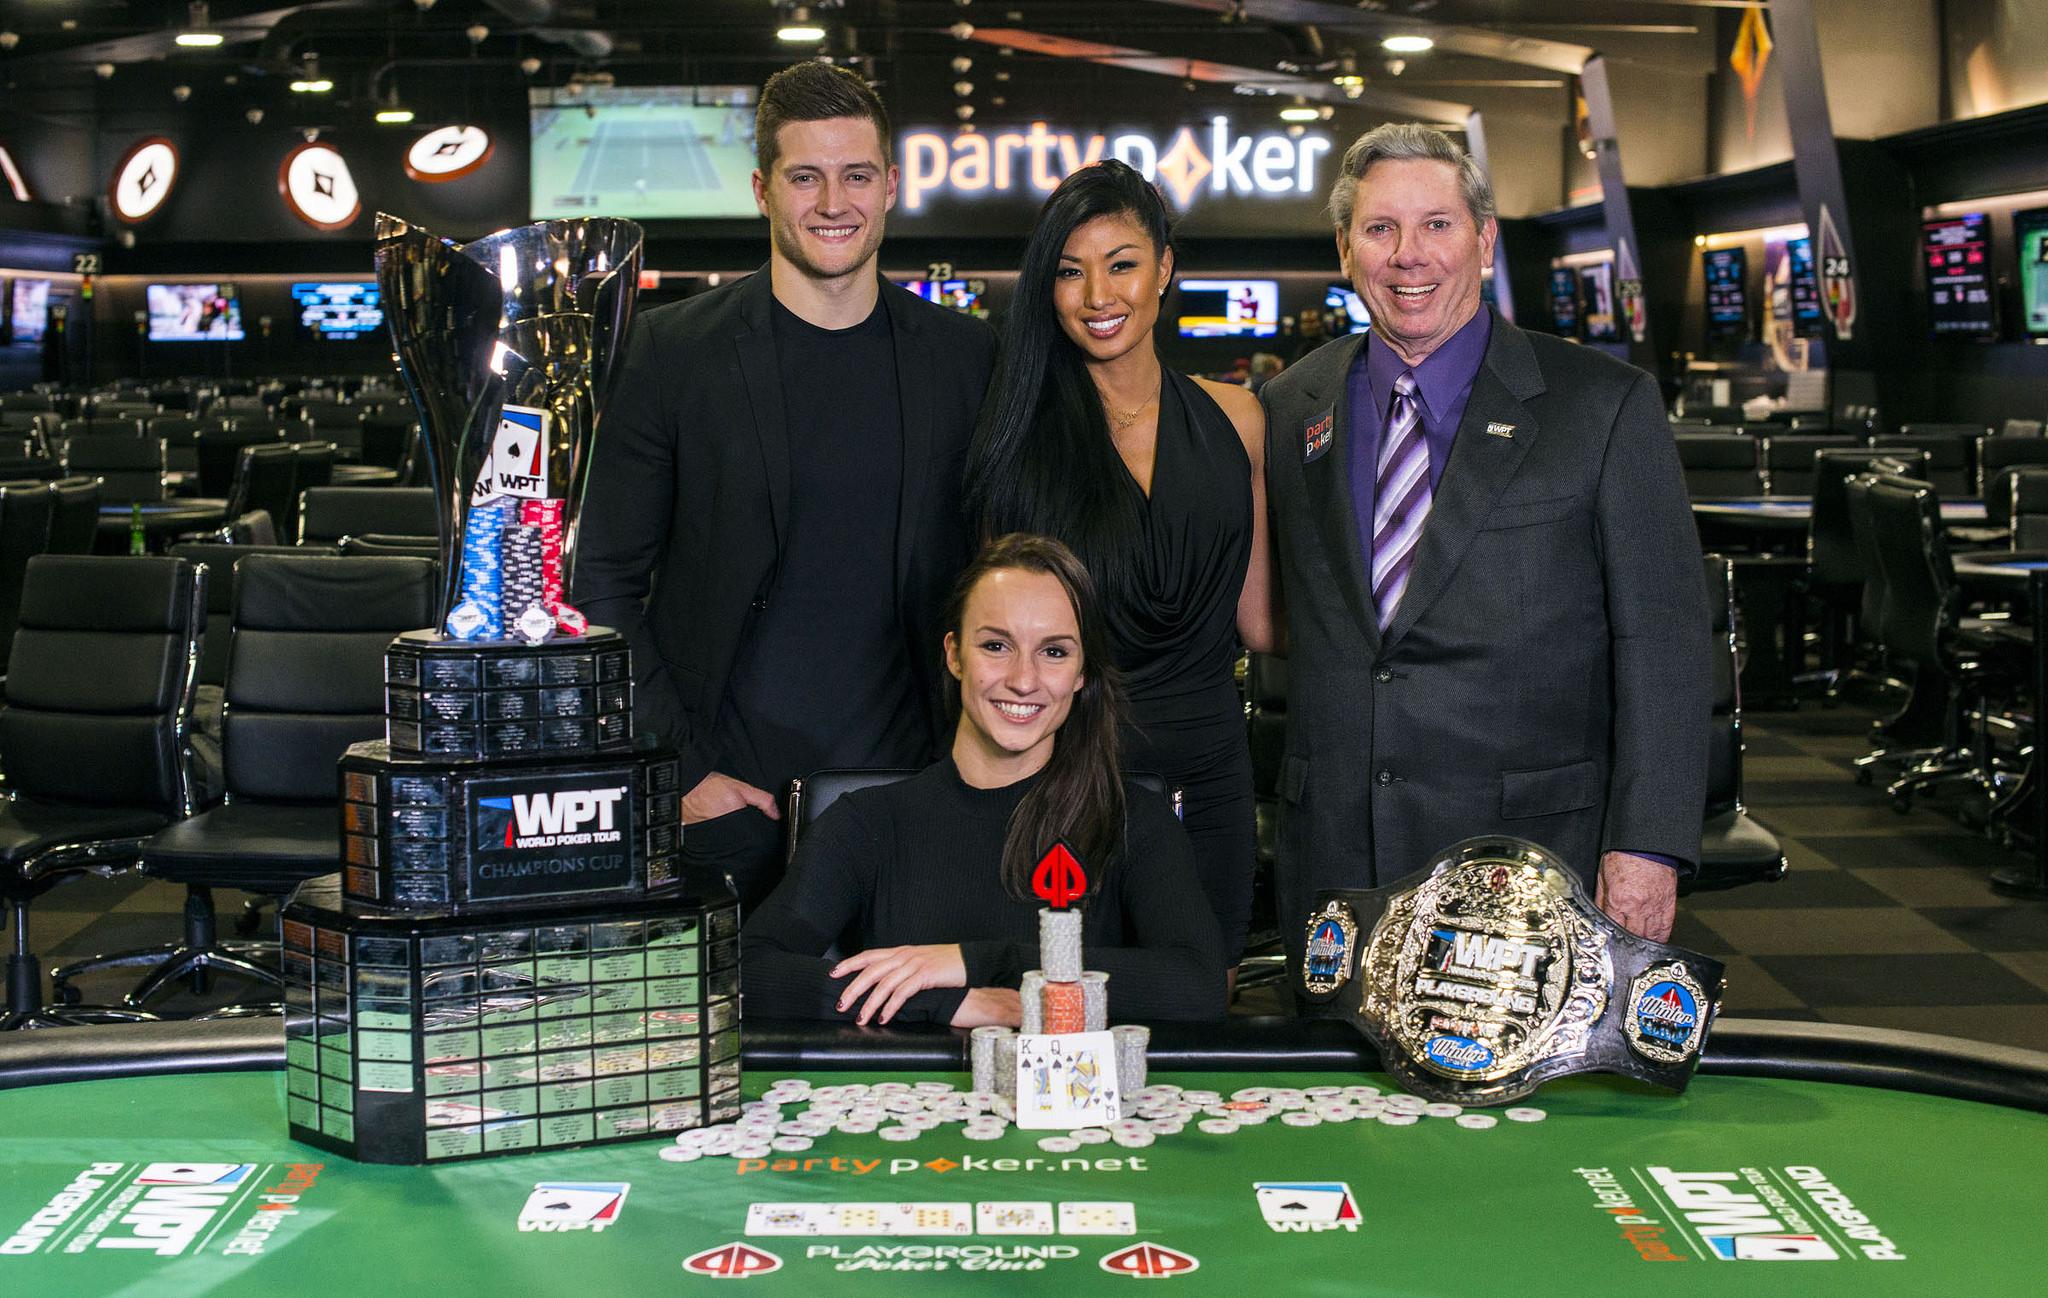 Poker casino montreal atlantic city casino weekend getaways